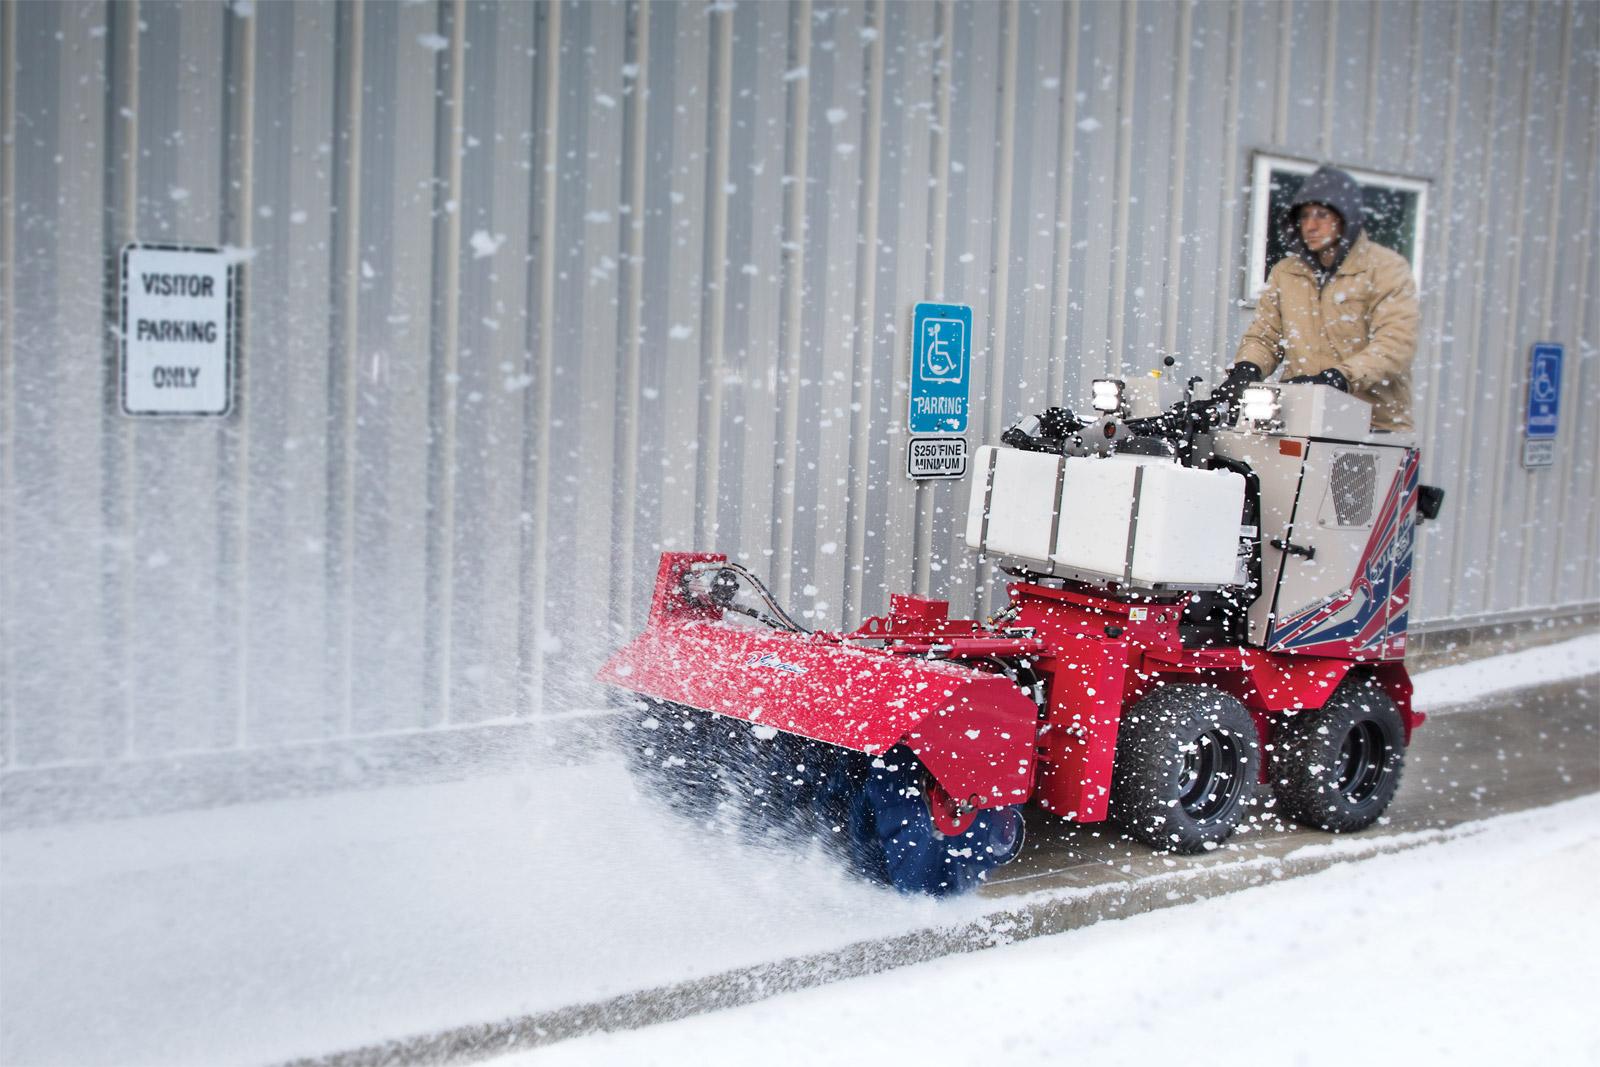 Ventrac Sidewalk Snow Vehicle Bison Turf Equipment, Inc